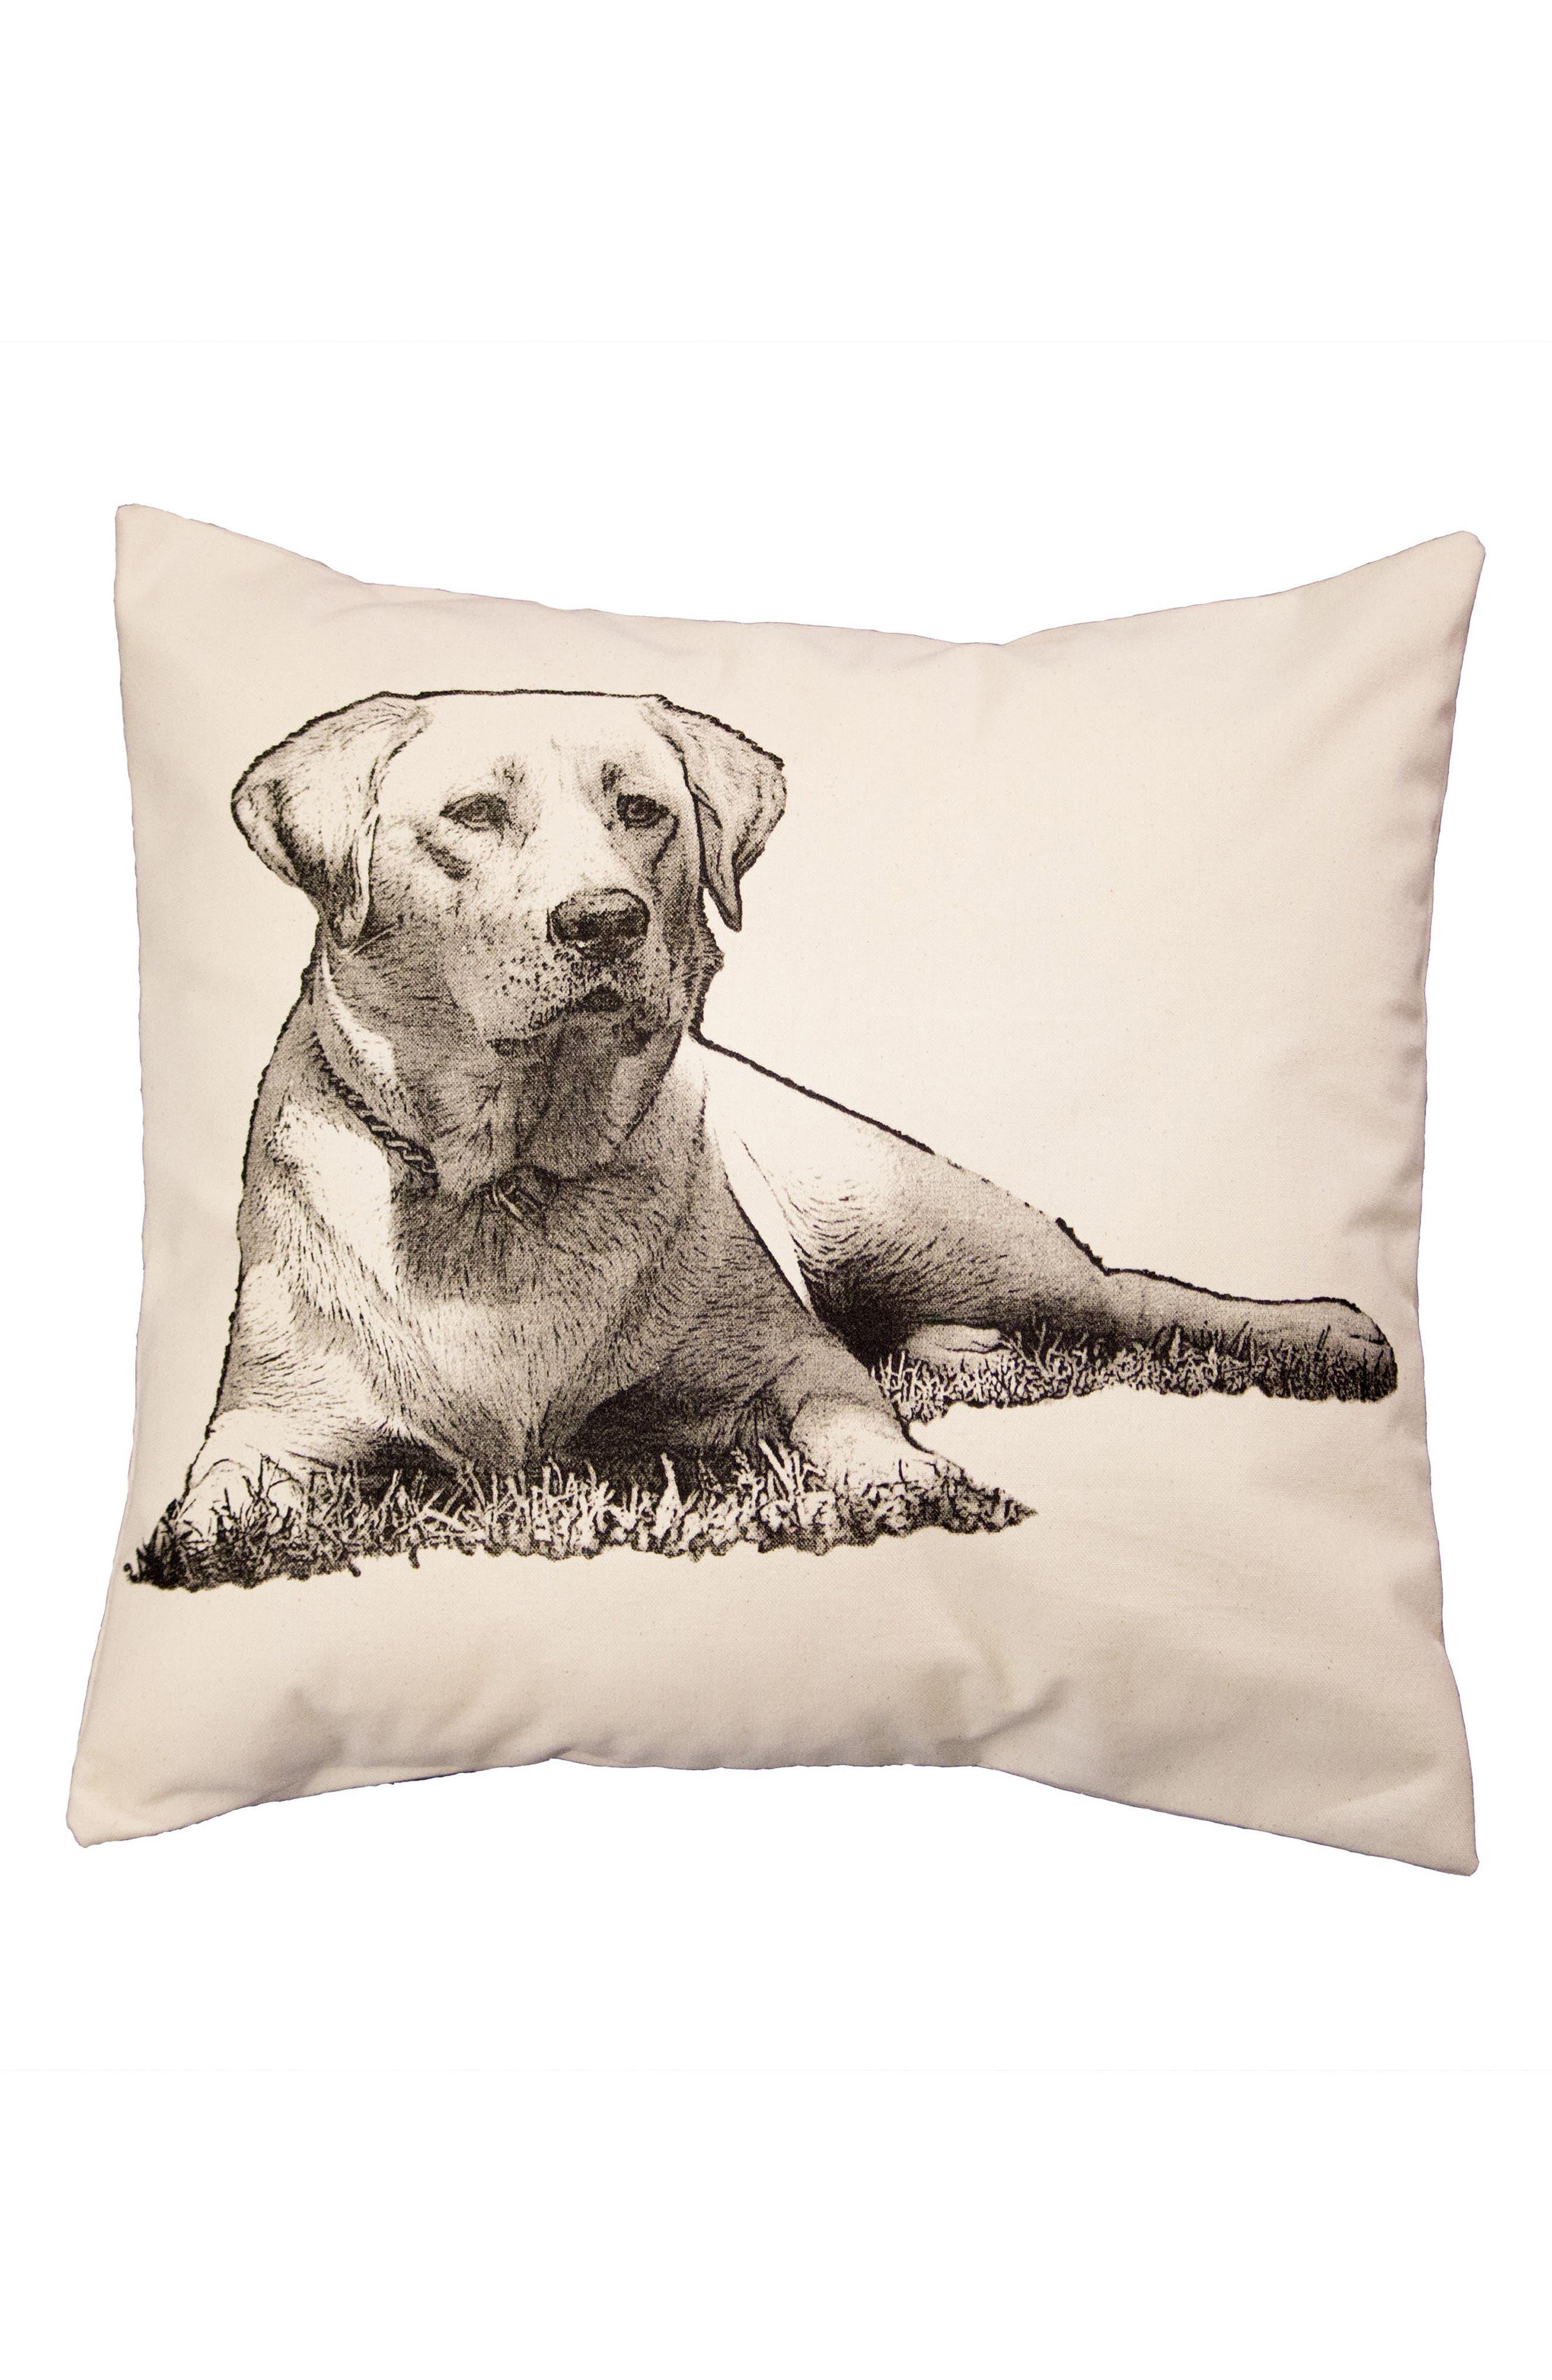 Animal Accent Pillow,                             Main thumbnail 7, color,